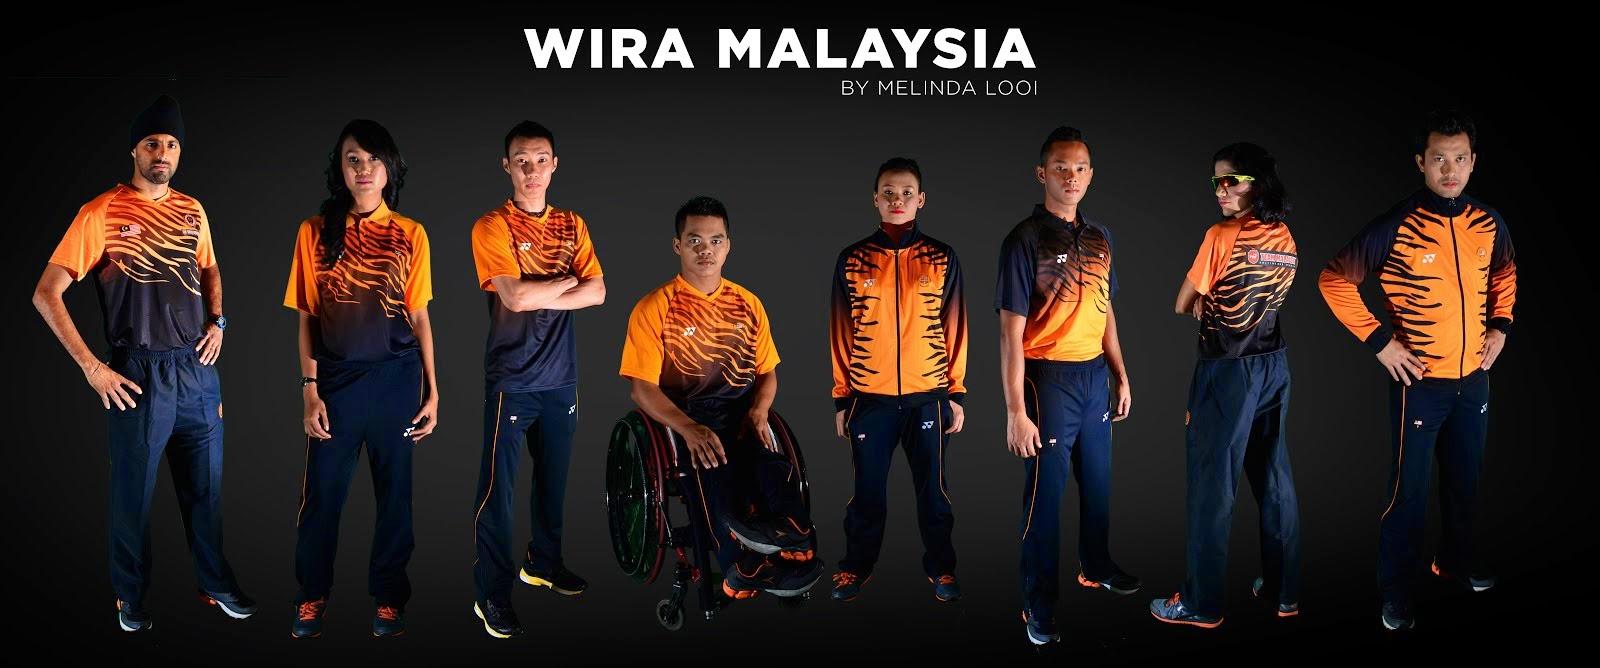 #WiraMalaysia